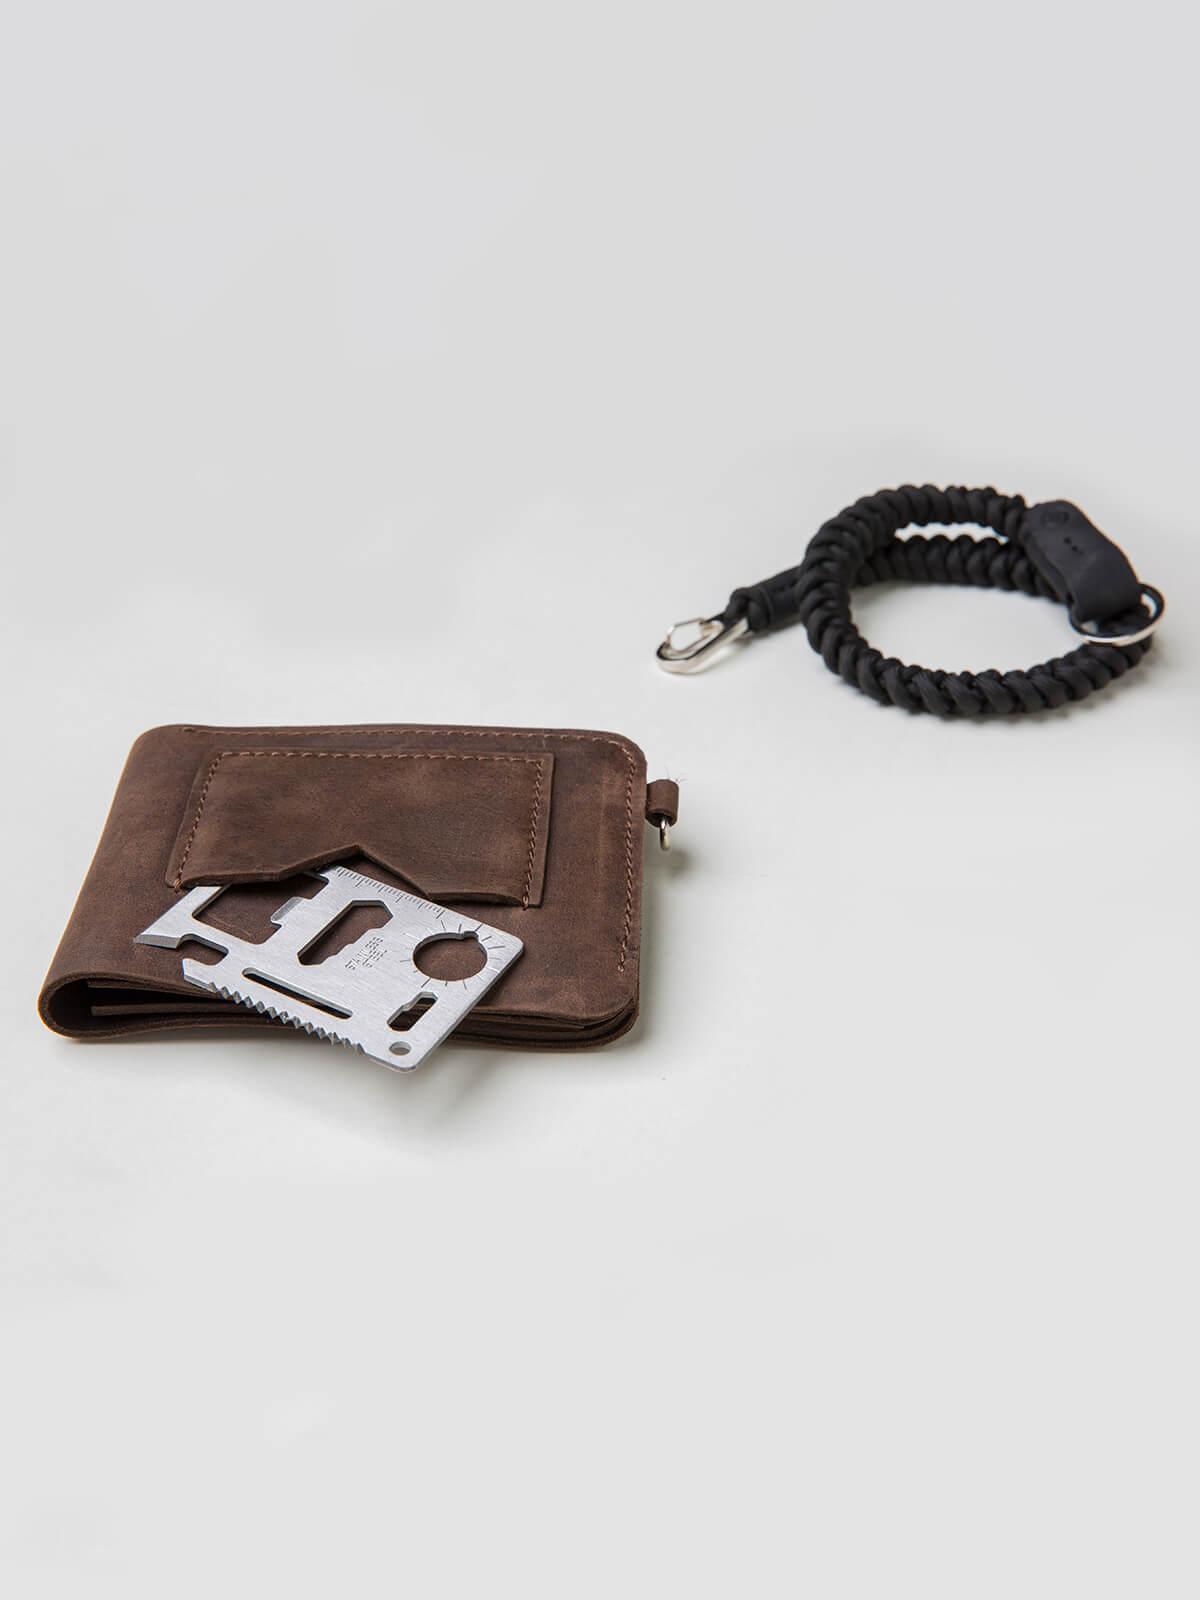 Wallet Roundel. Color brown. 2.